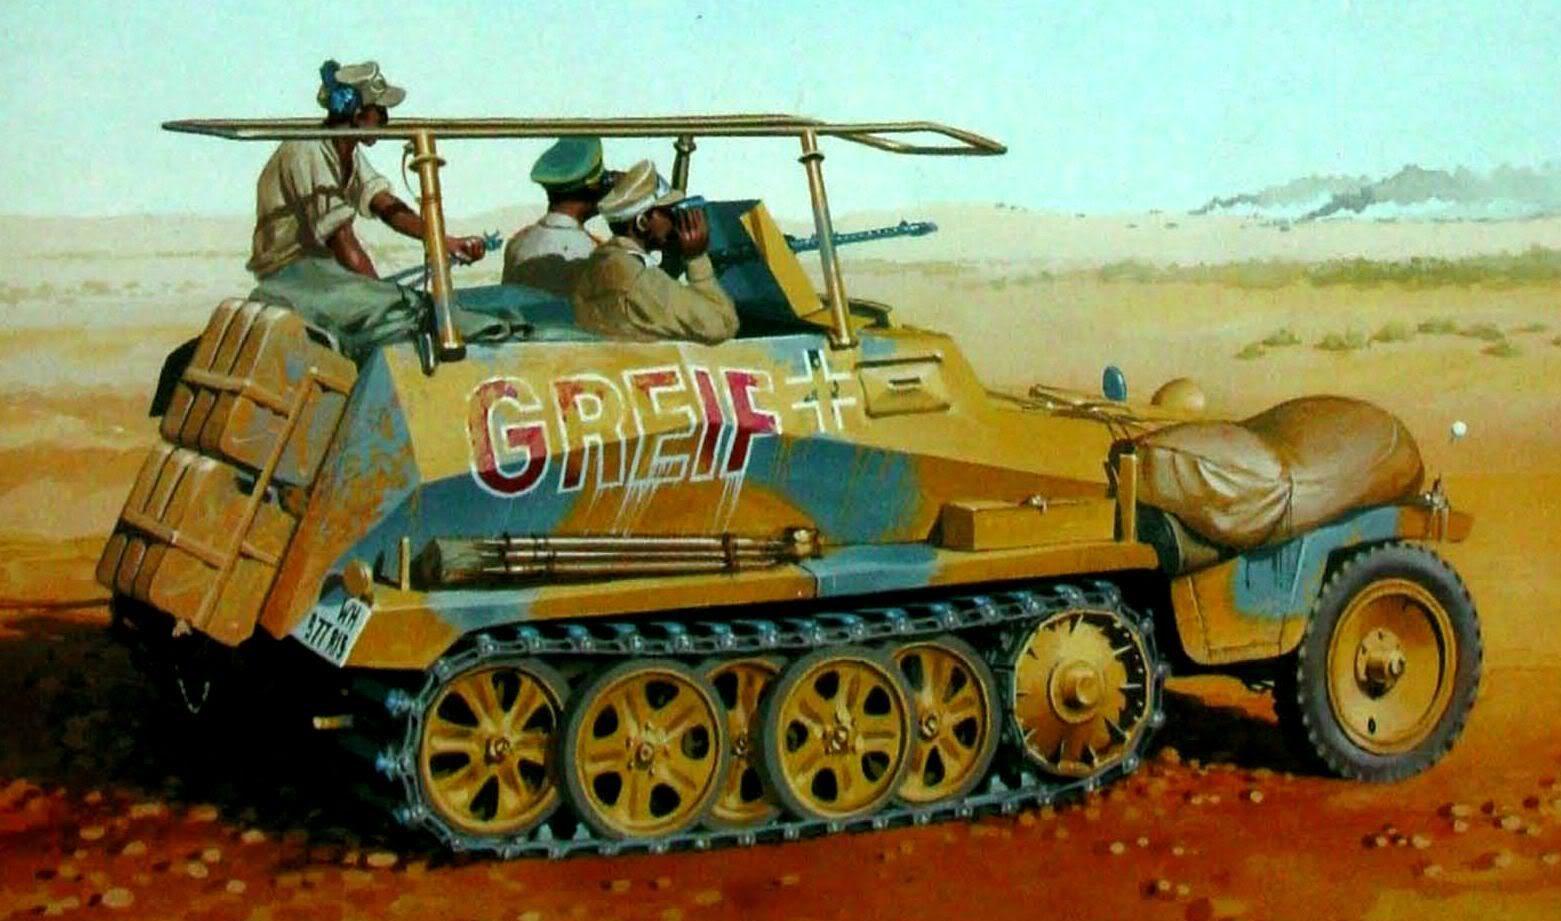 Wrobel Jaroslaw. Бронеавтомобиль Sd.kfz. 250-3 «Greif'».